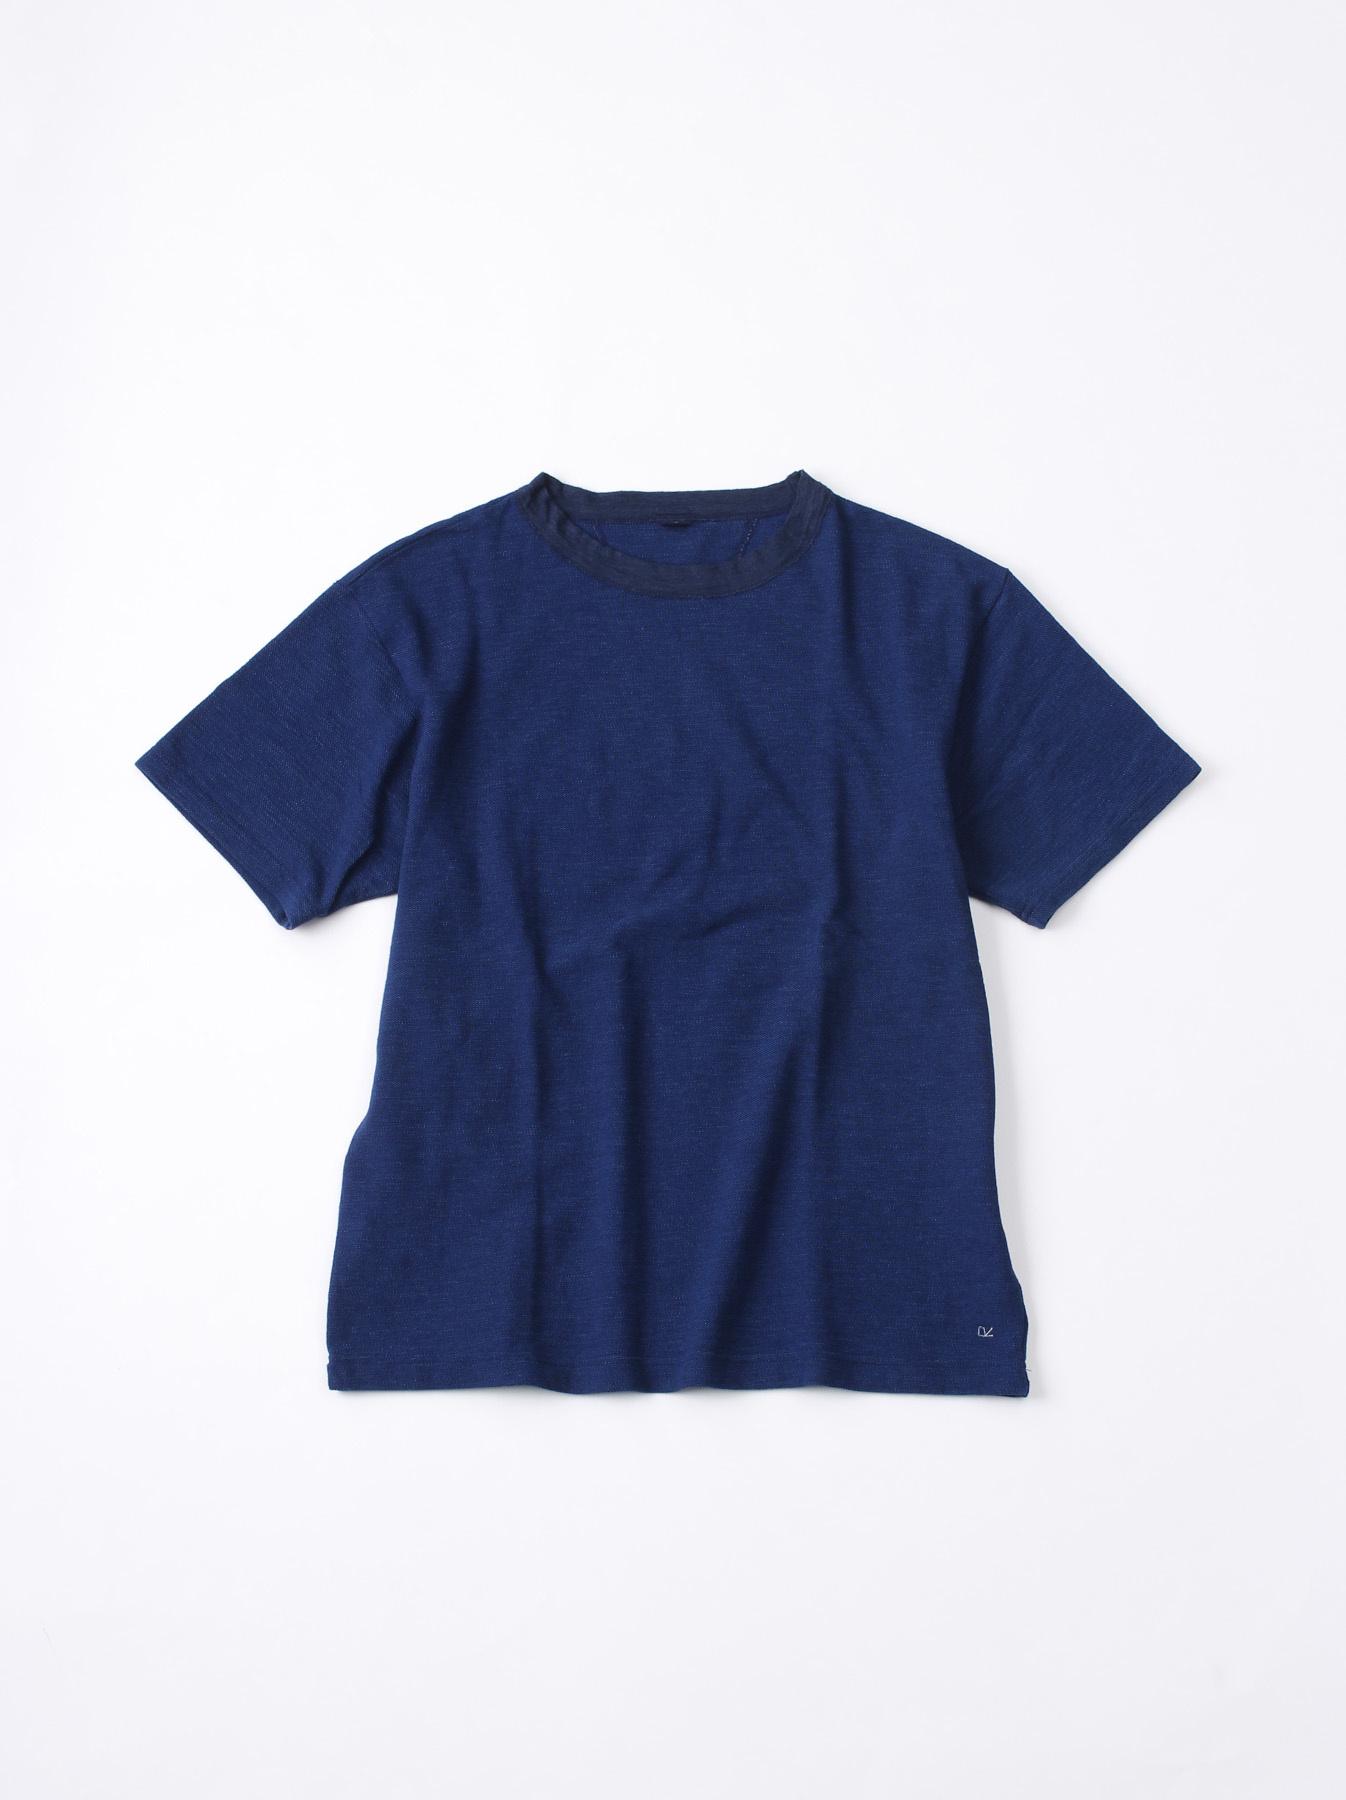 WH Indigo Ultimate Pique T-shirt Distressed-1